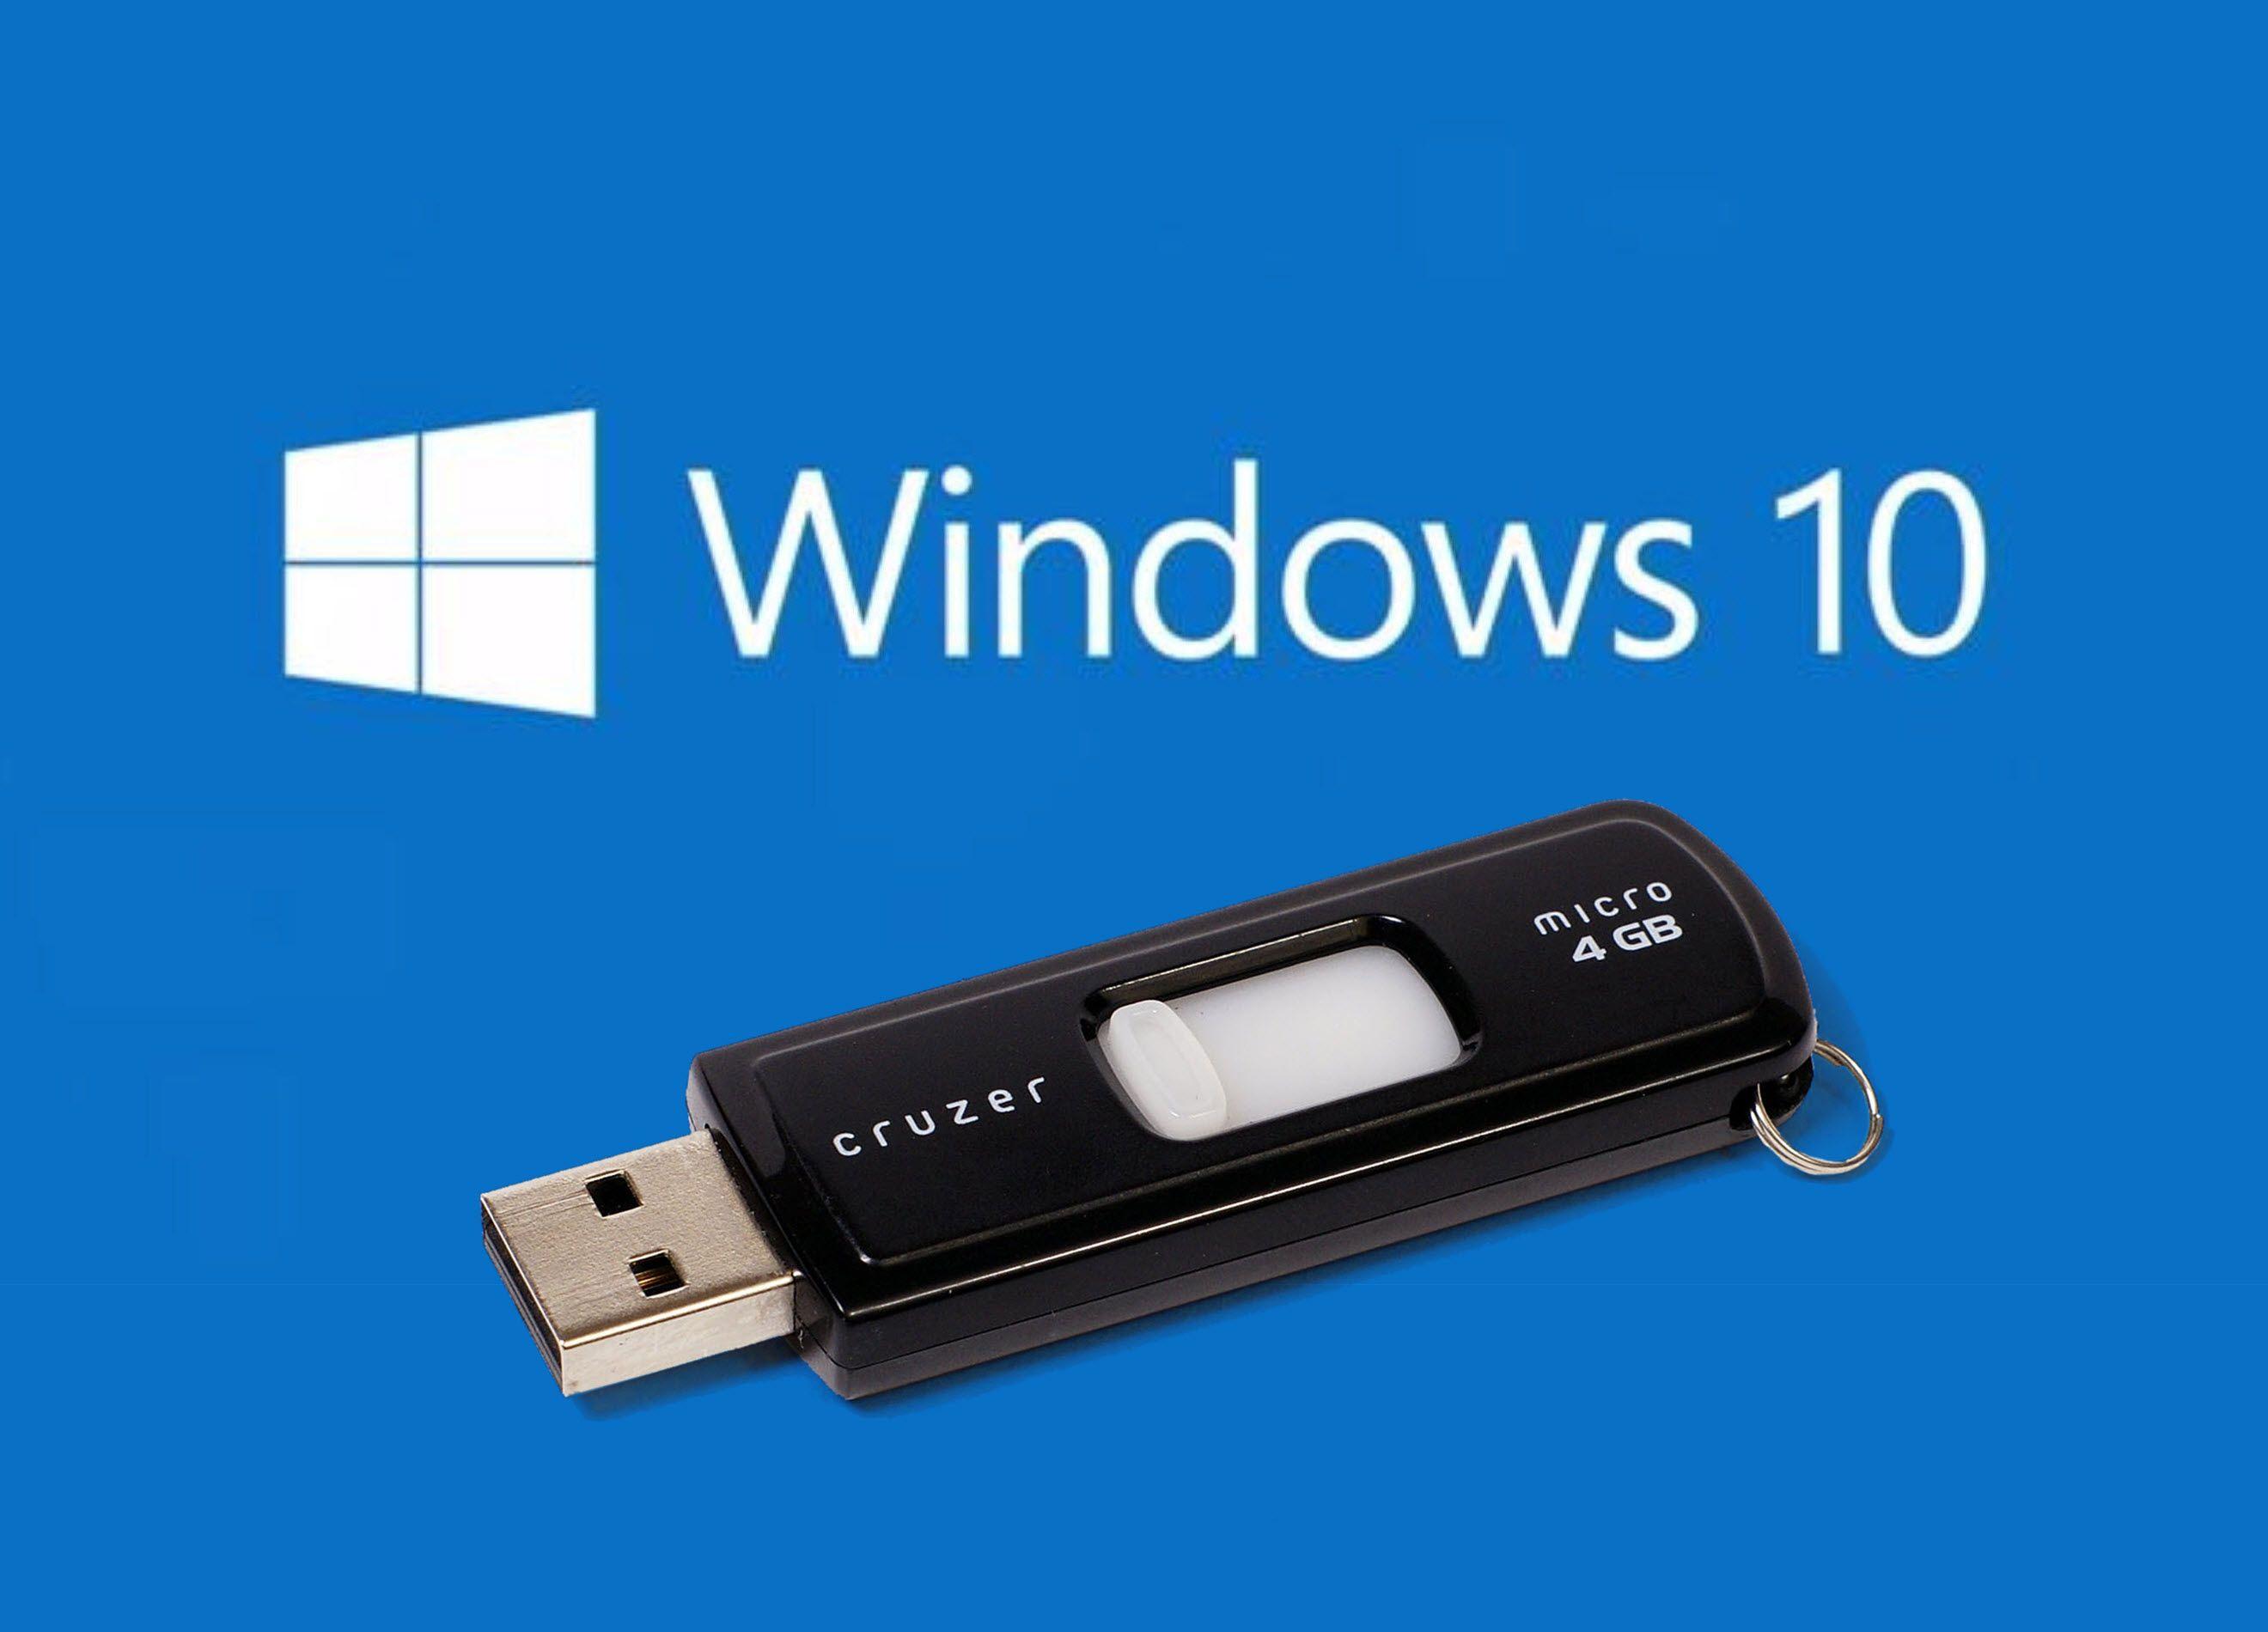 3 Easy Ways To Create Uefi Or Legacy Bootable Usb Windows 10 Installation Media With Images Windows 10 Windows 10 Hacks Usb Flash Drive